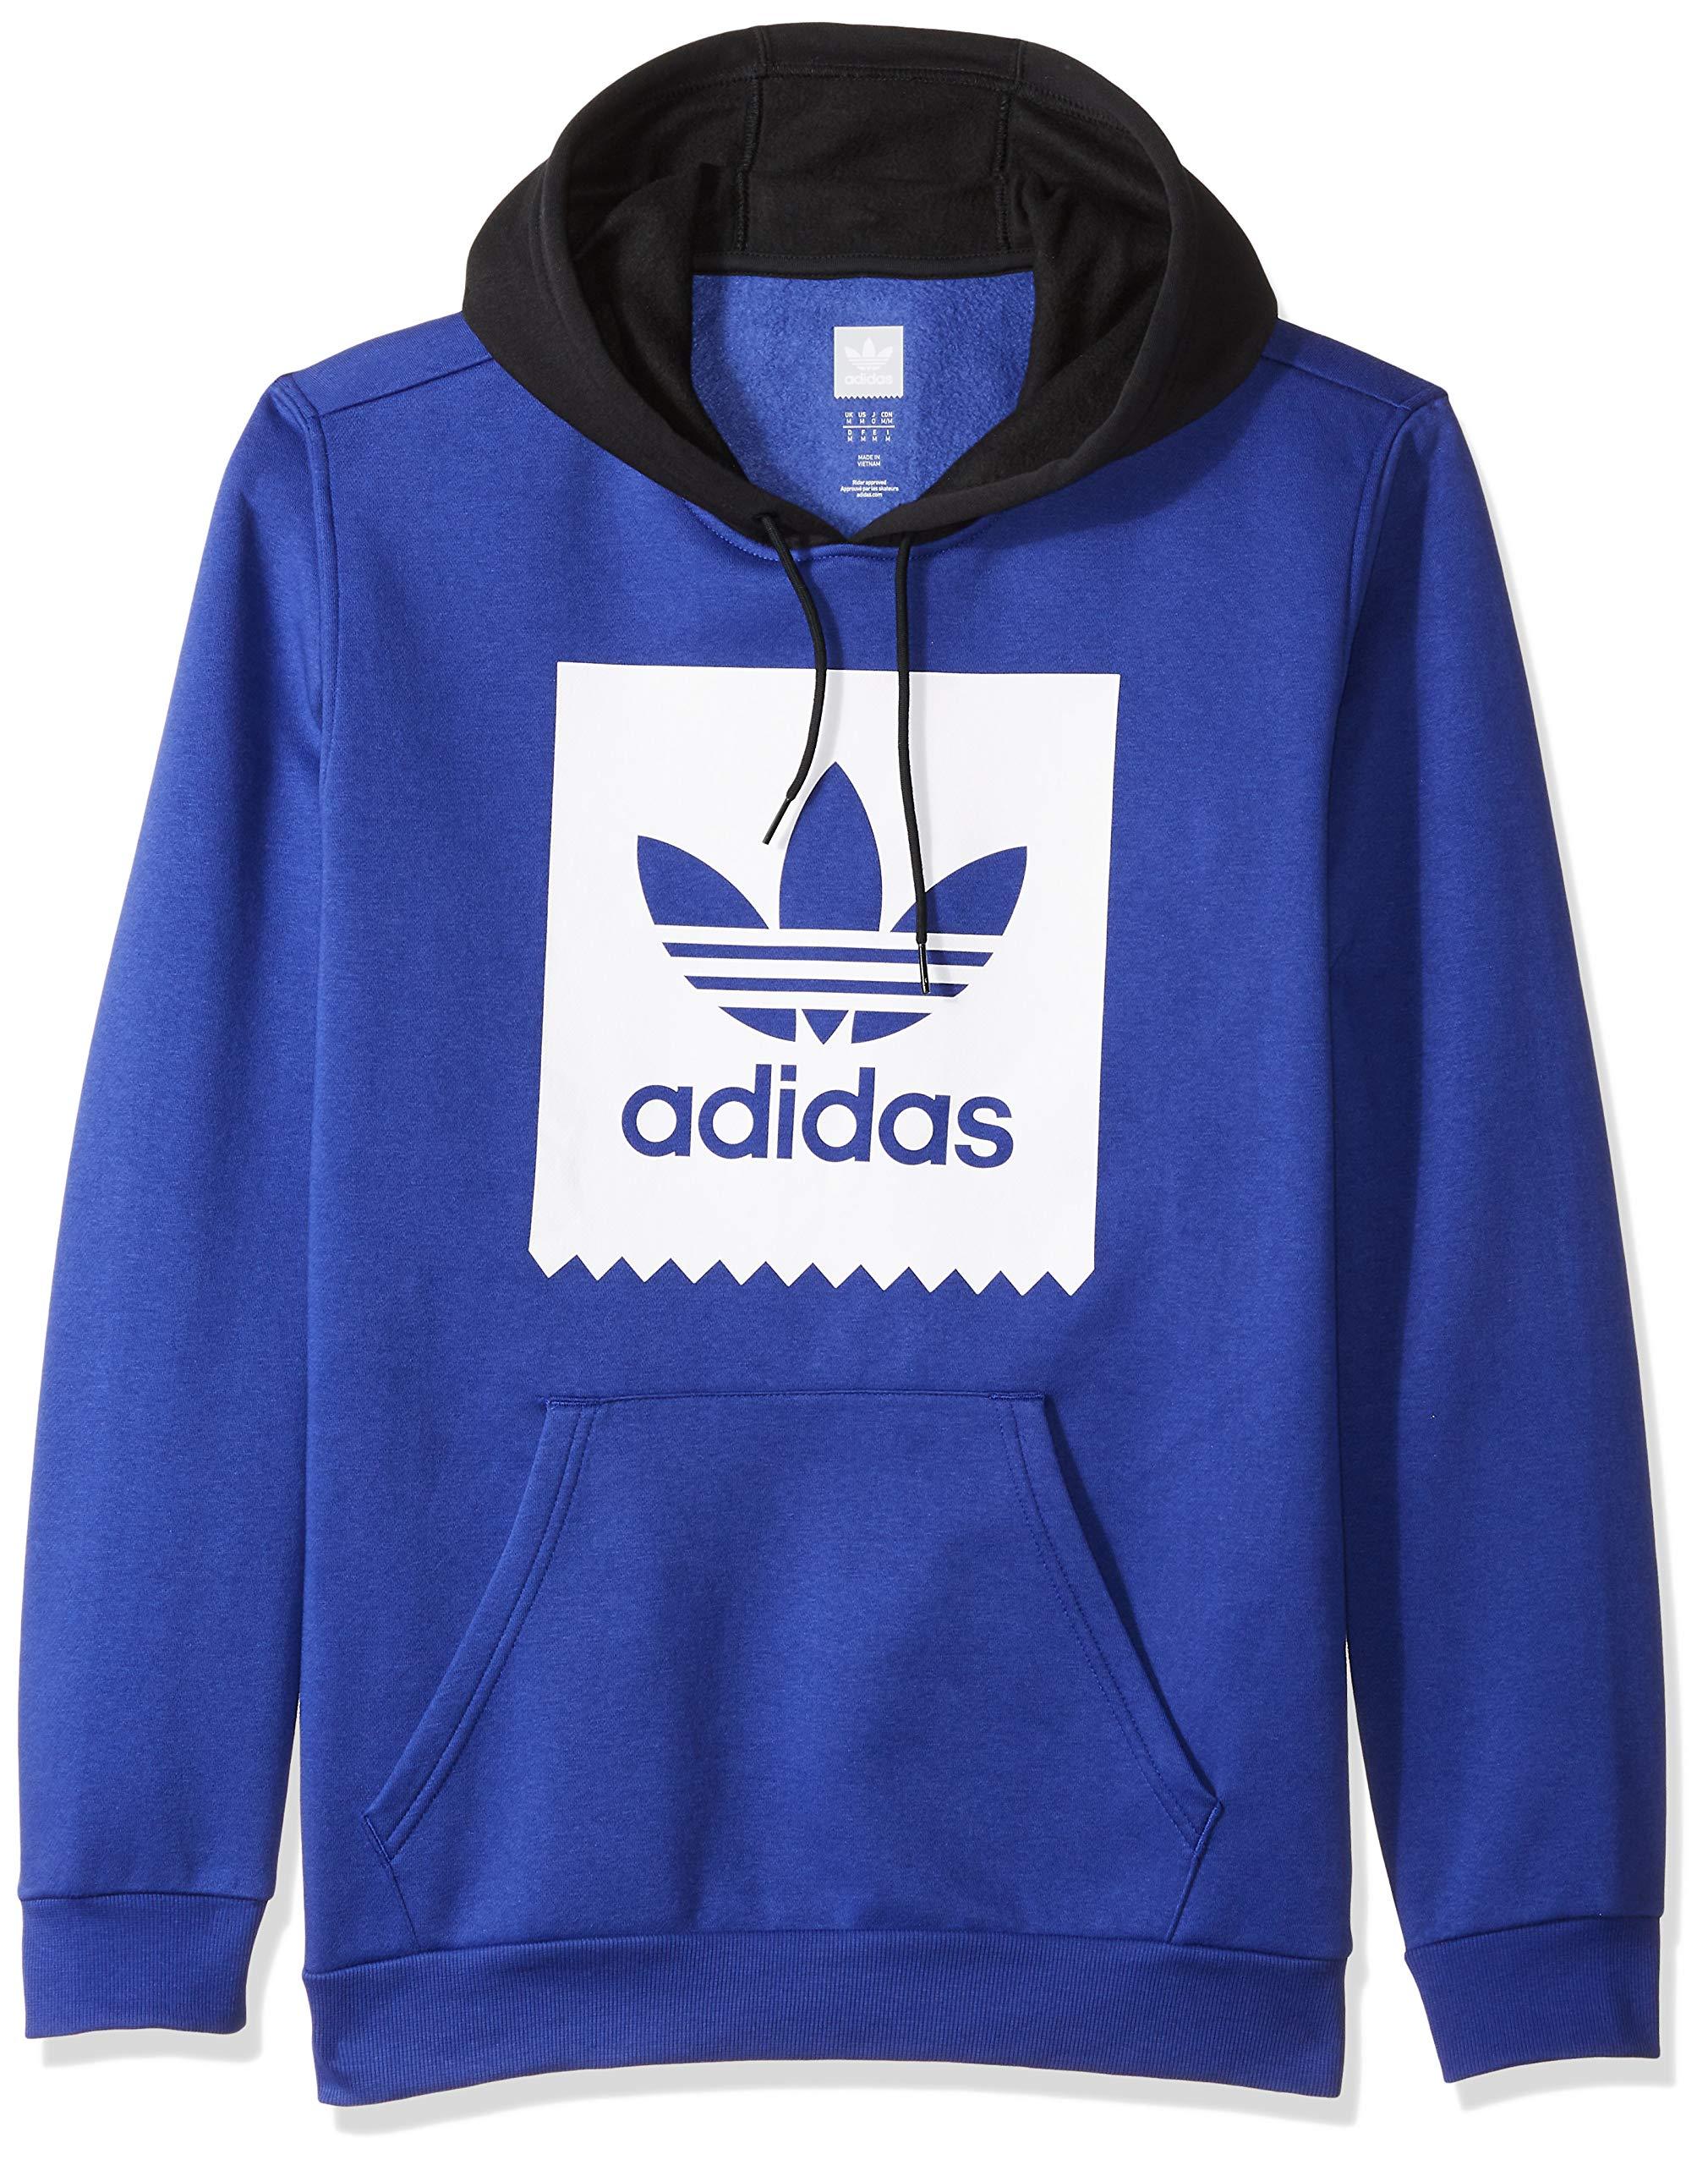 adidas Originals Men's Solid Bb Hoodie, active blue/white/black, X-Small by adidas Originals